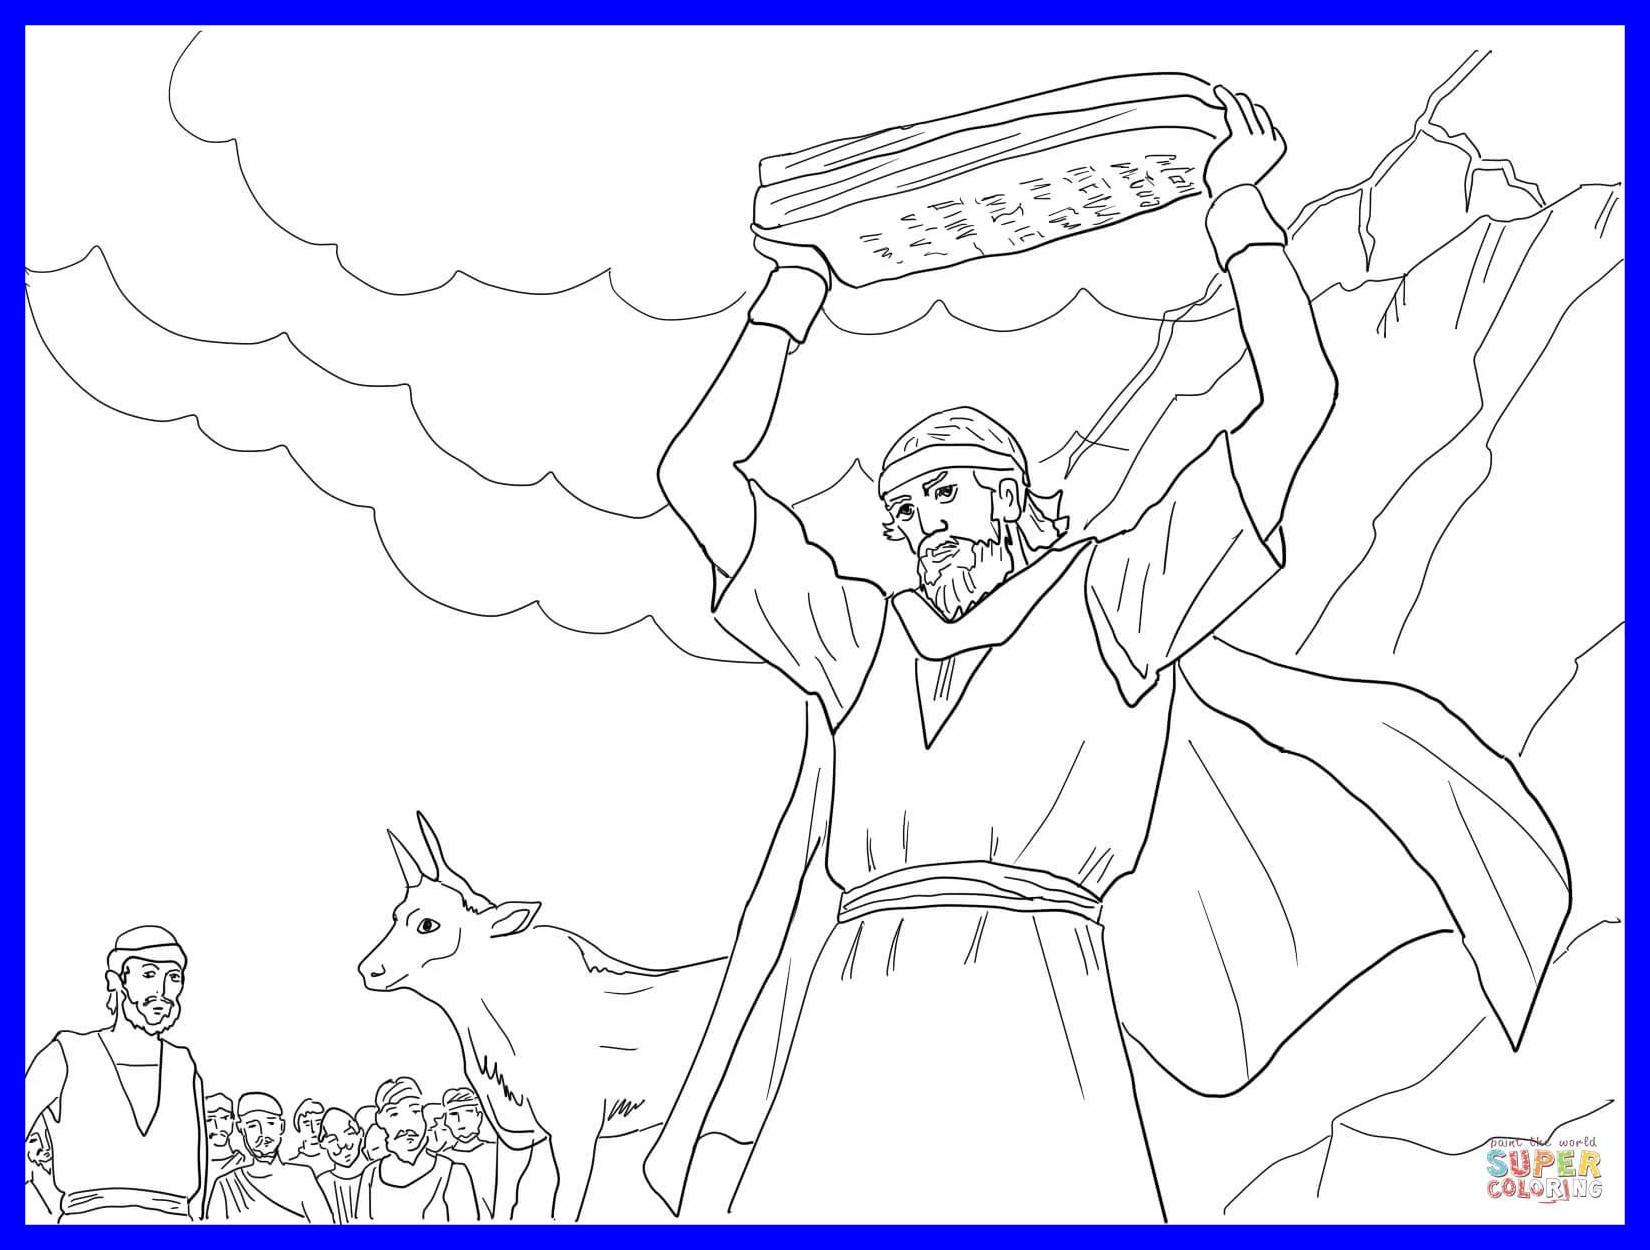 1650x1250 Shrewd Hagar And Ishmael Coloring Page Garden Of Praise Bible